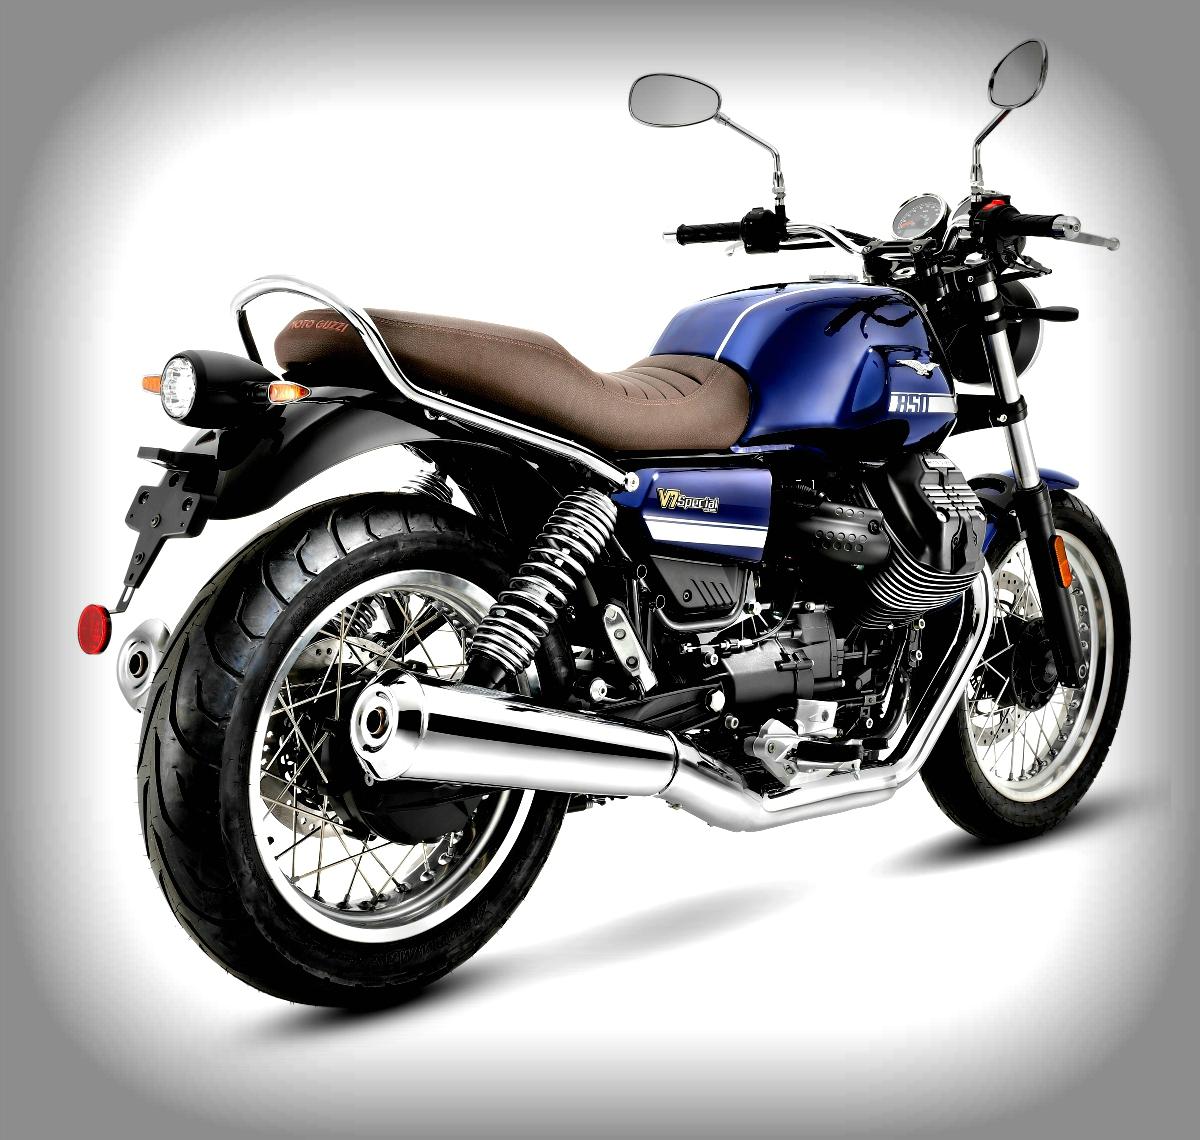 2021 Moto Guzzi V7 Special 2